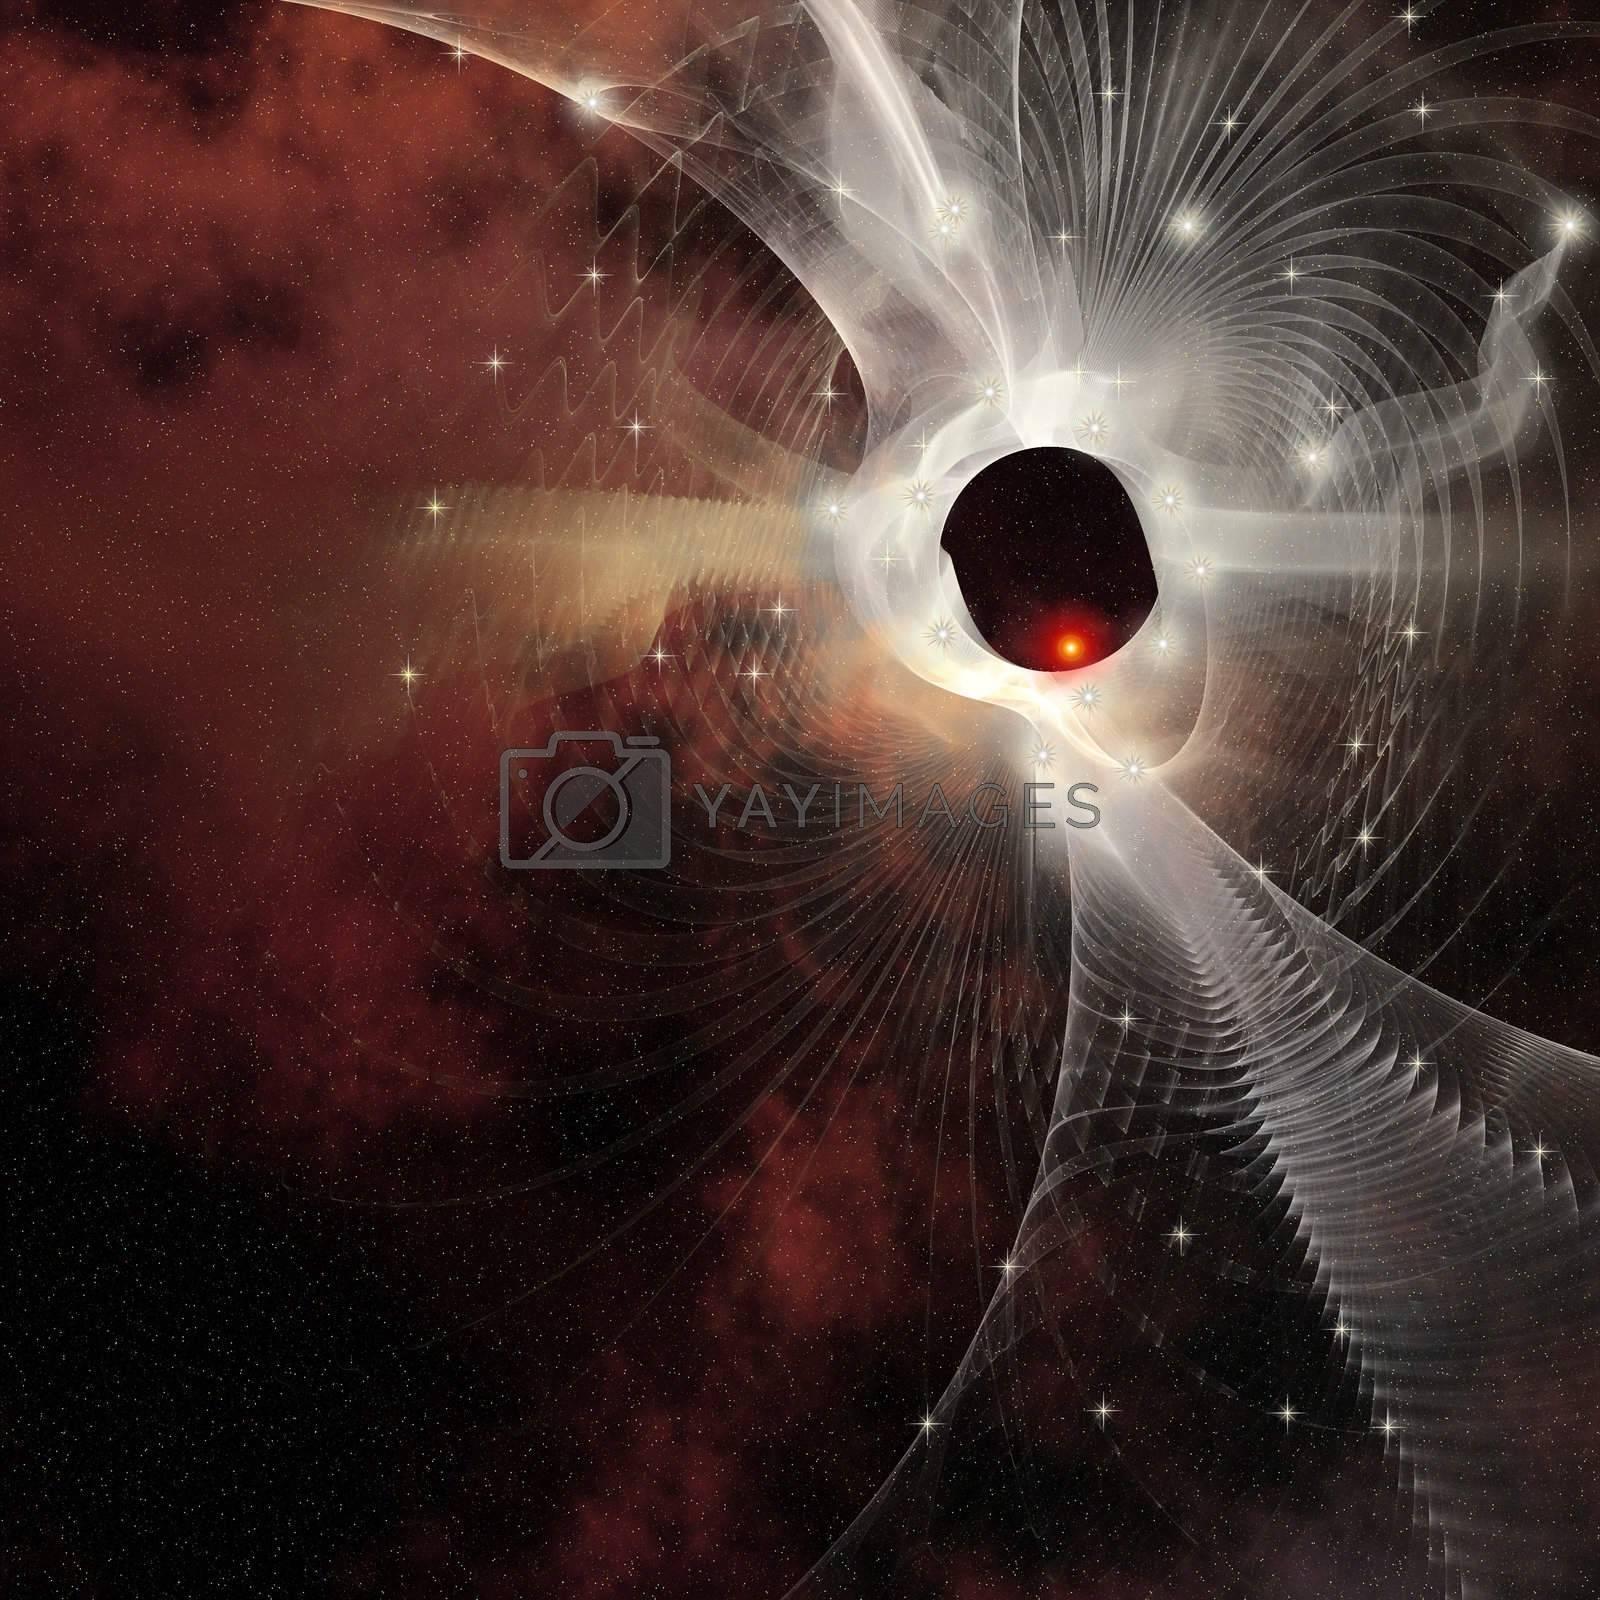 A nebula forms gossamer cobweb like strands in the cosmos.